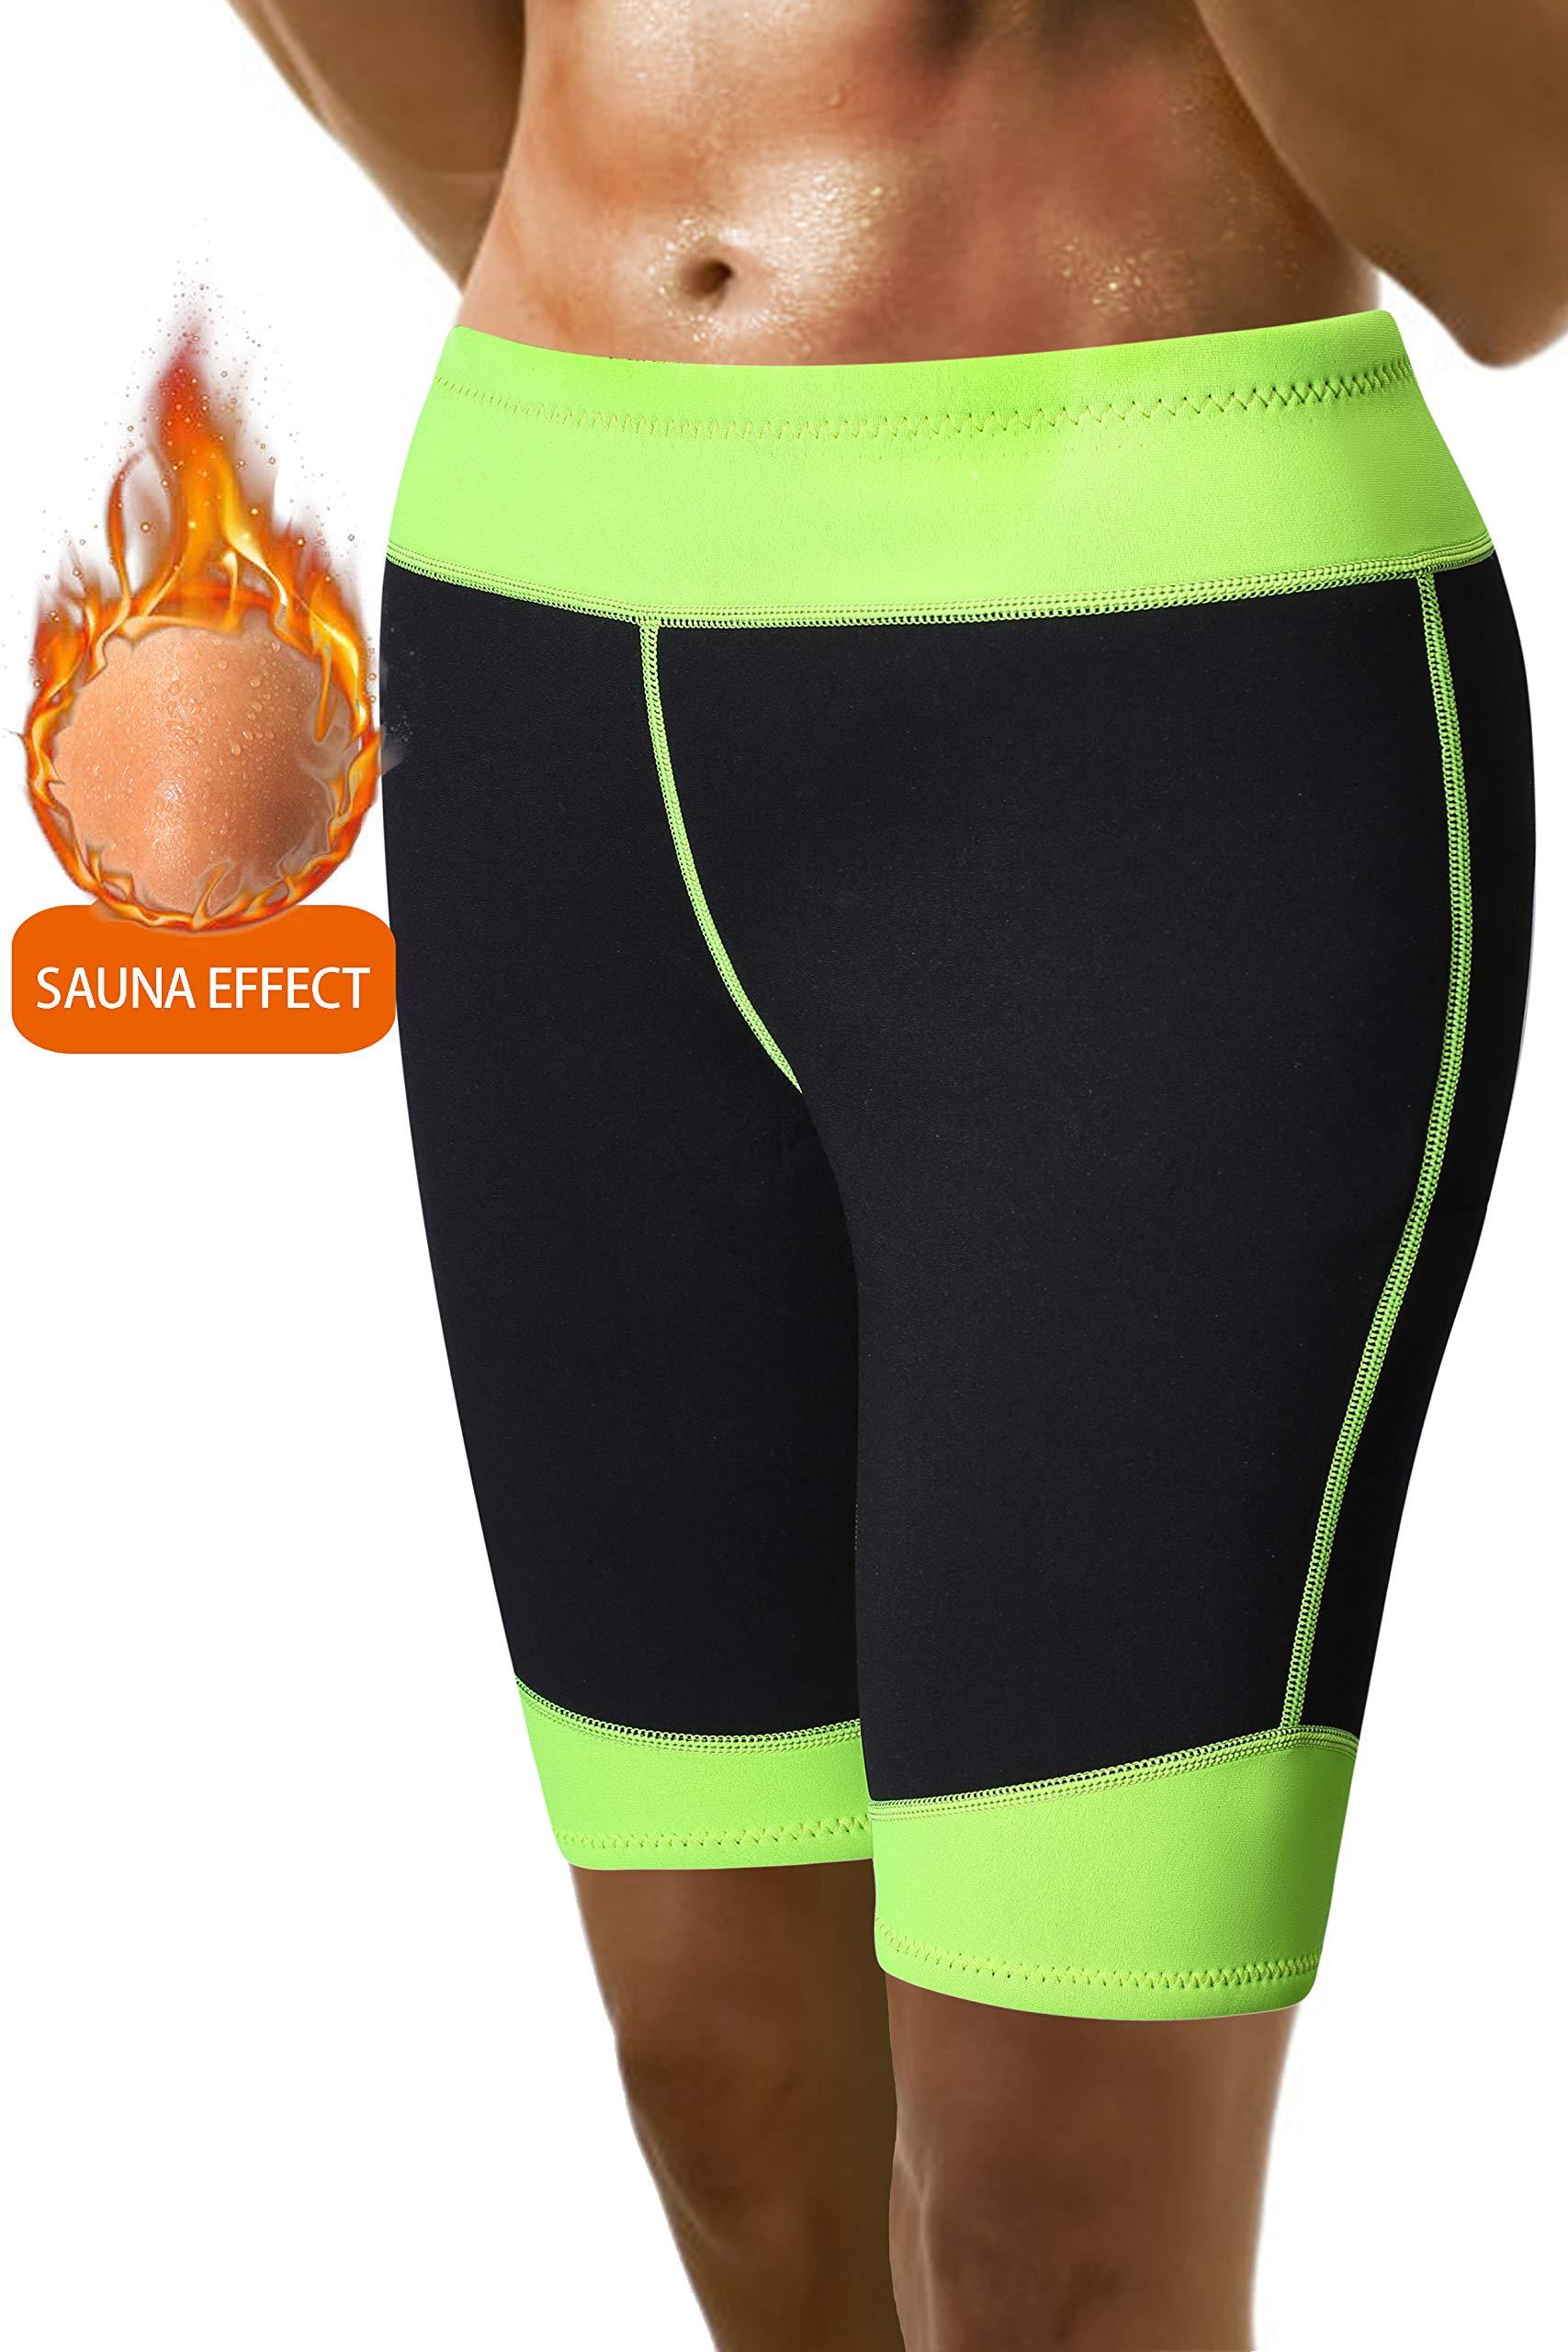 Pneacimi Women Neoprene Active Fitness Yoga Running Exercise Shorts for Weight Loss (3XL, Black)